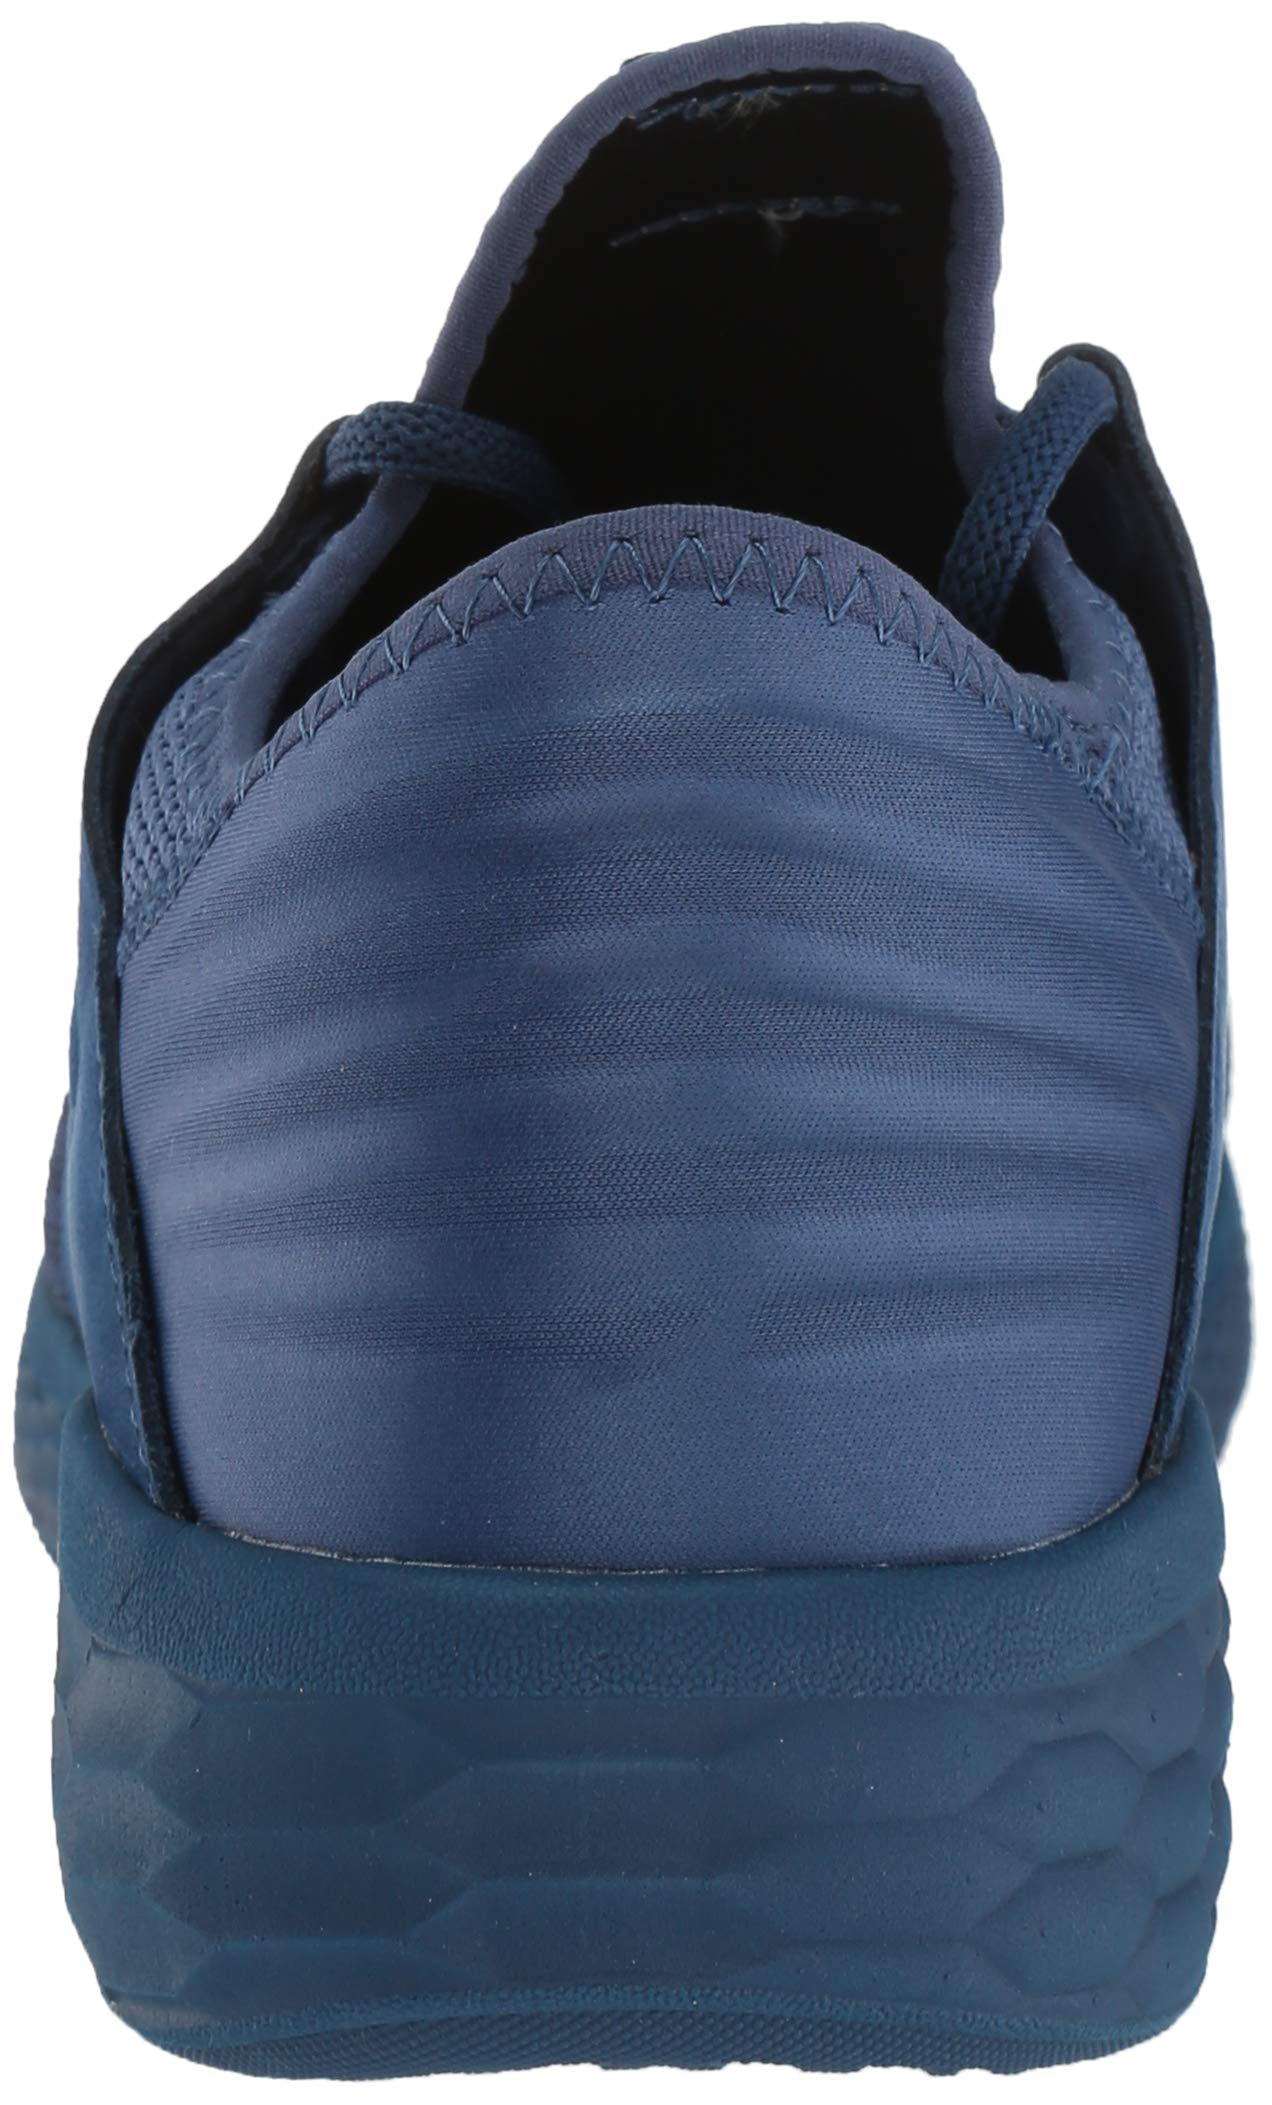 New Balance Men's Cruz V2 Fresh Foam Running Shoe, moroccan tile, 7 D US by New Balance (Image #2)